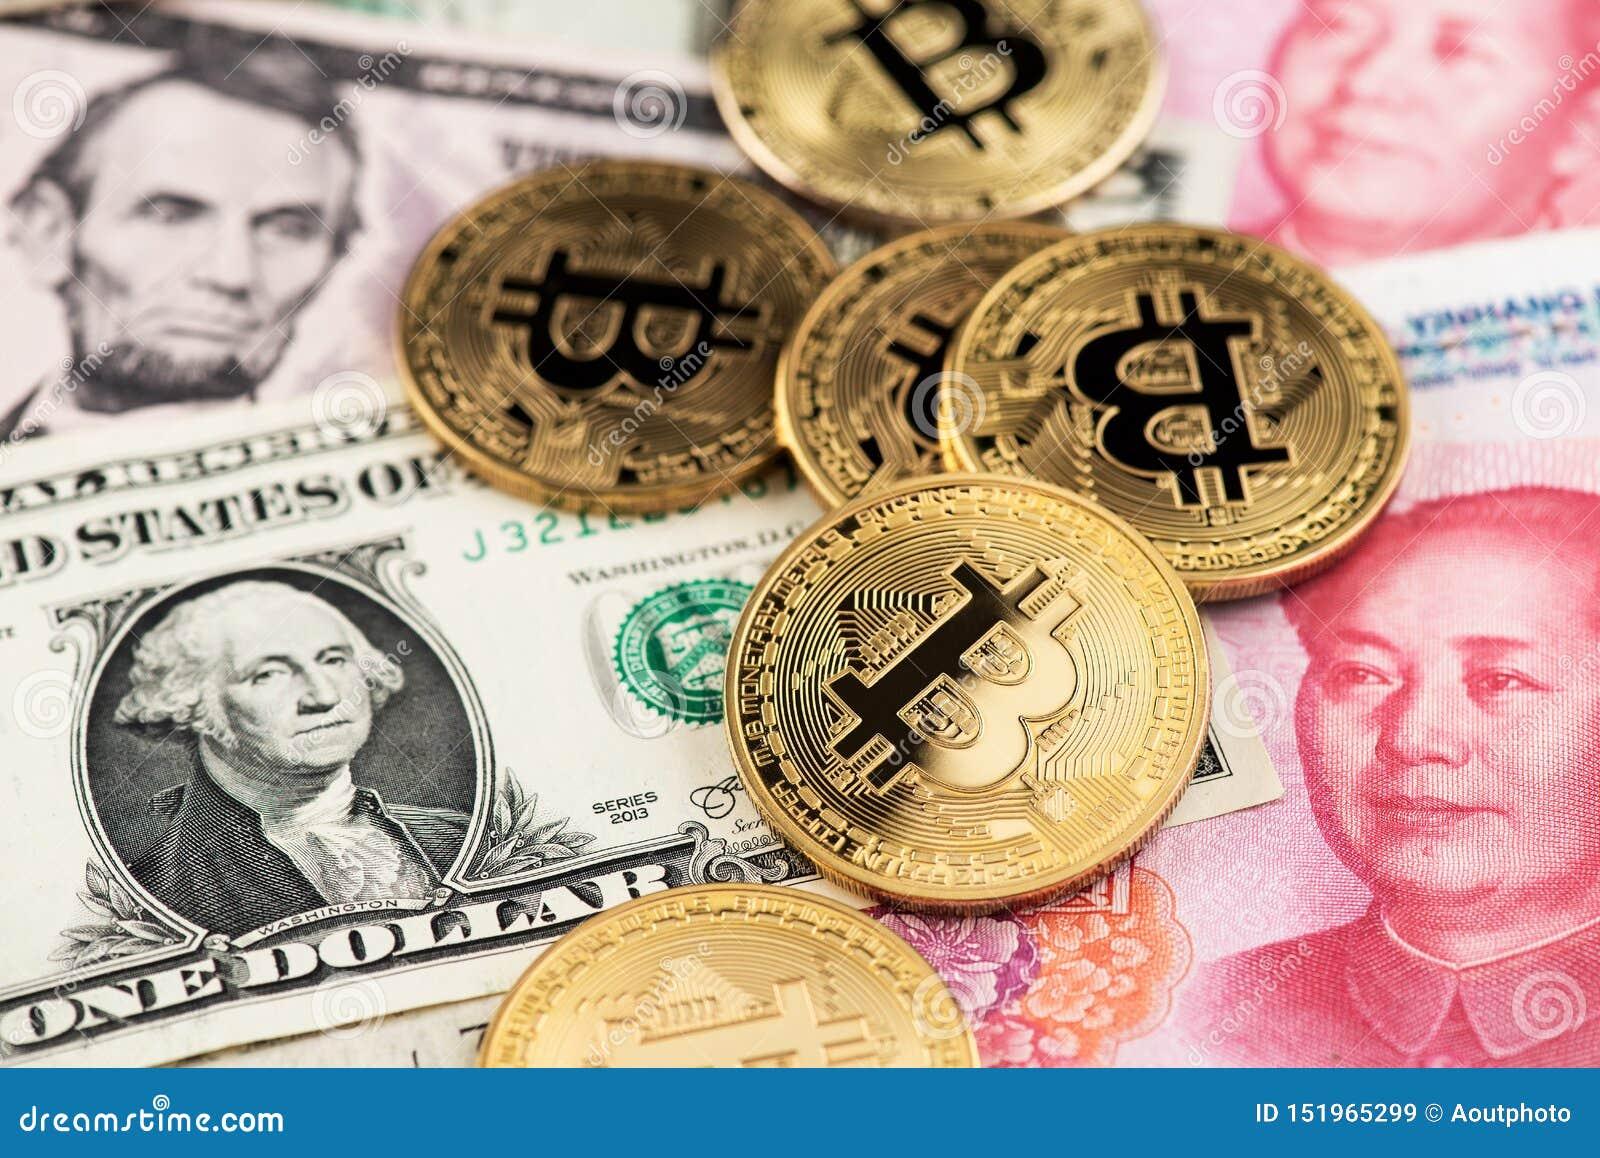 dolar bitcoin hoje